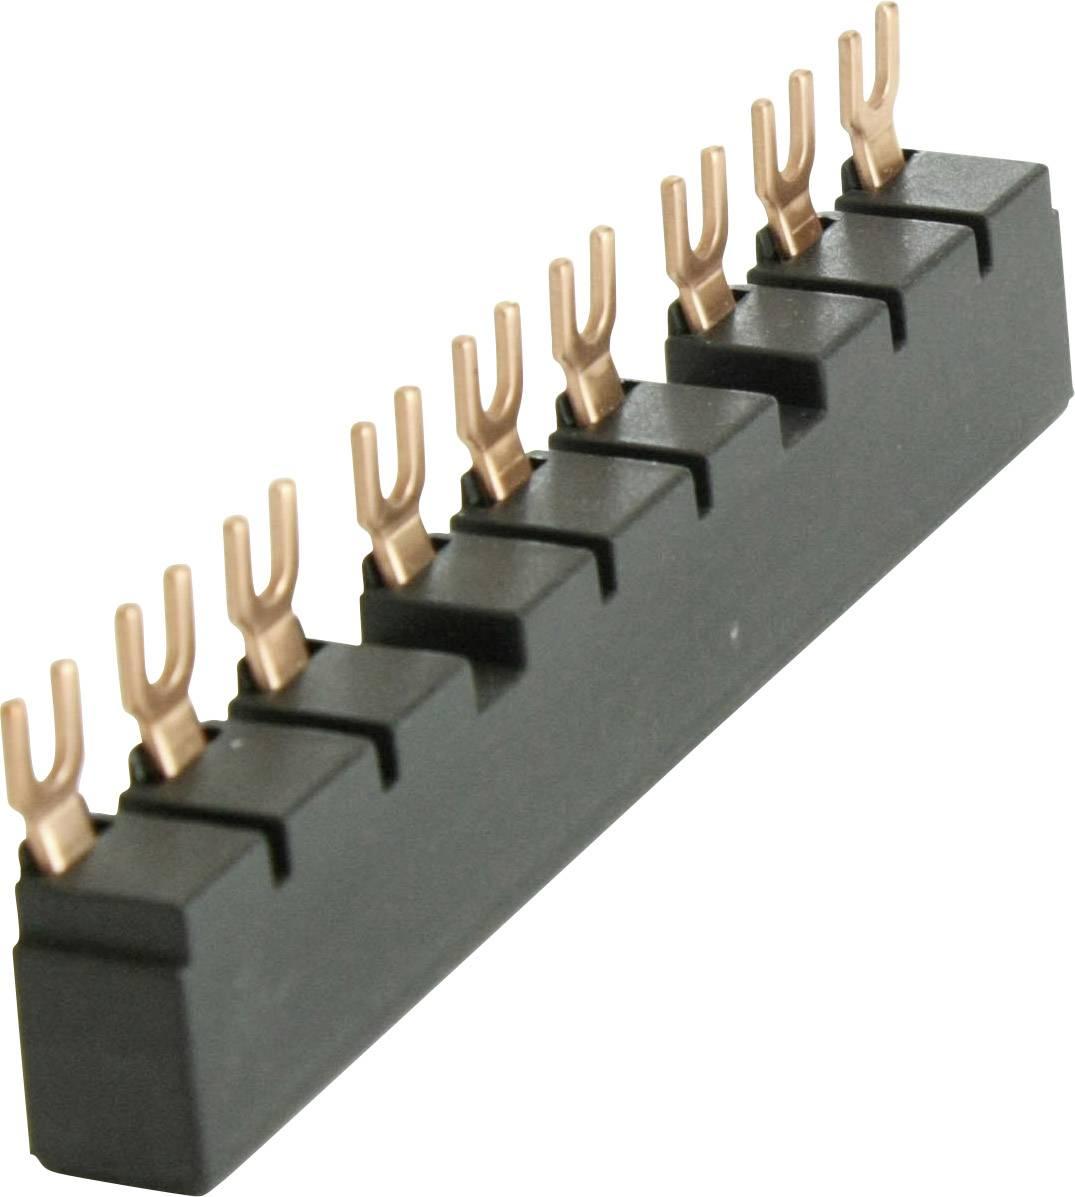 Fázová lišta WEG BBS45-3 BBS45-3, 690 V, 63 A, 1 ks